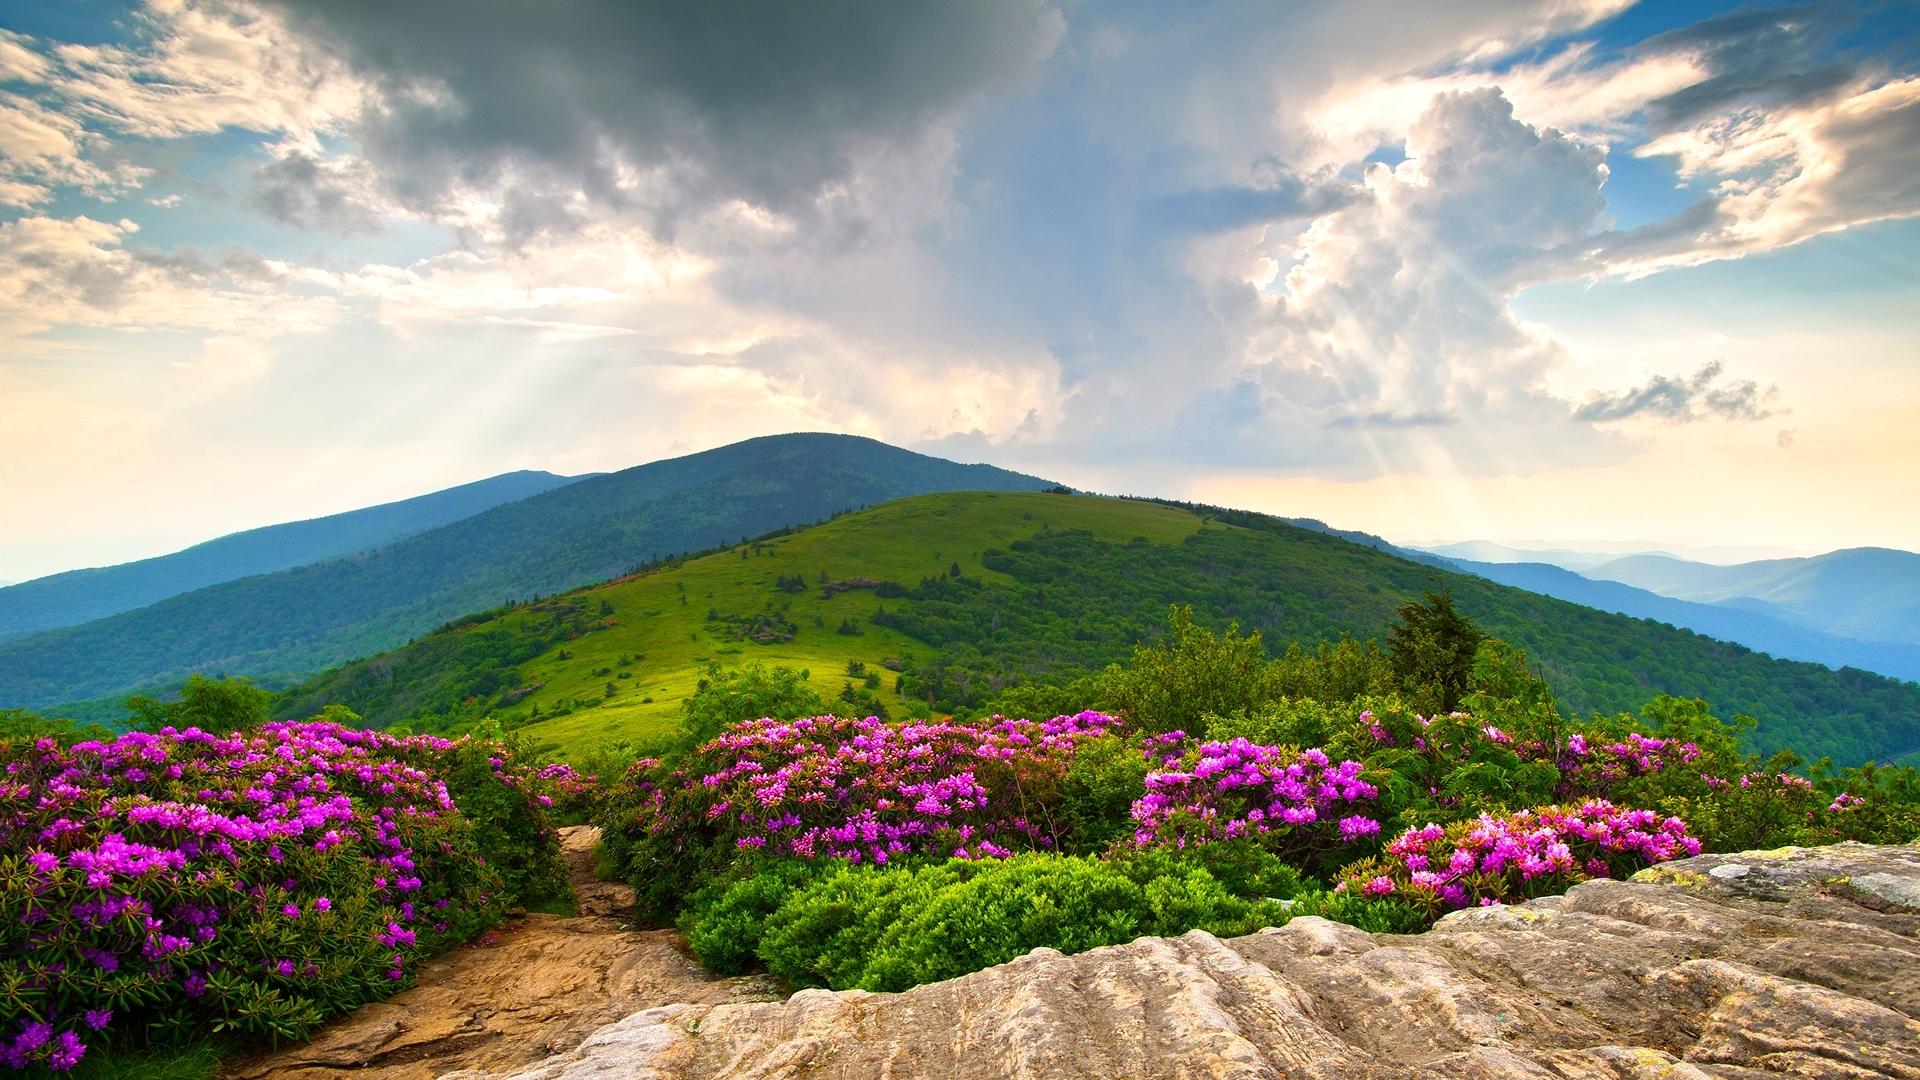 Beautiful Wallpaper Mountain Flower - 71647-1920x1080  Perfect Image Reference_85632.jpg